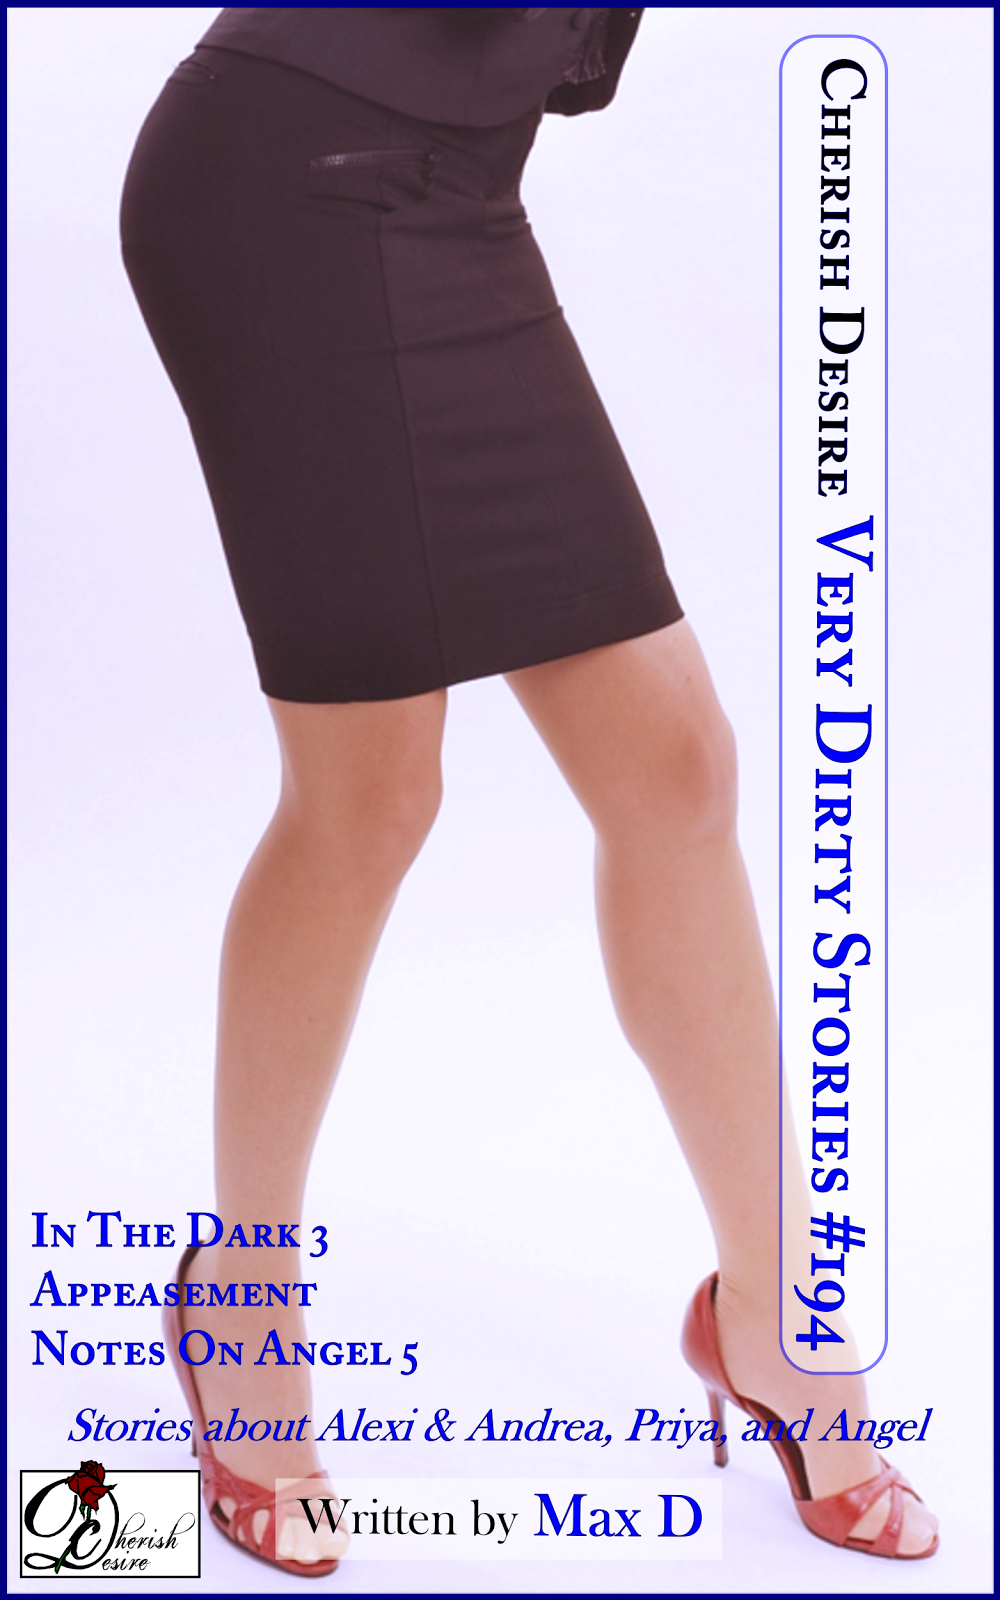 Cherish Desire: Very Dirty Stories #194, Max D, erotica